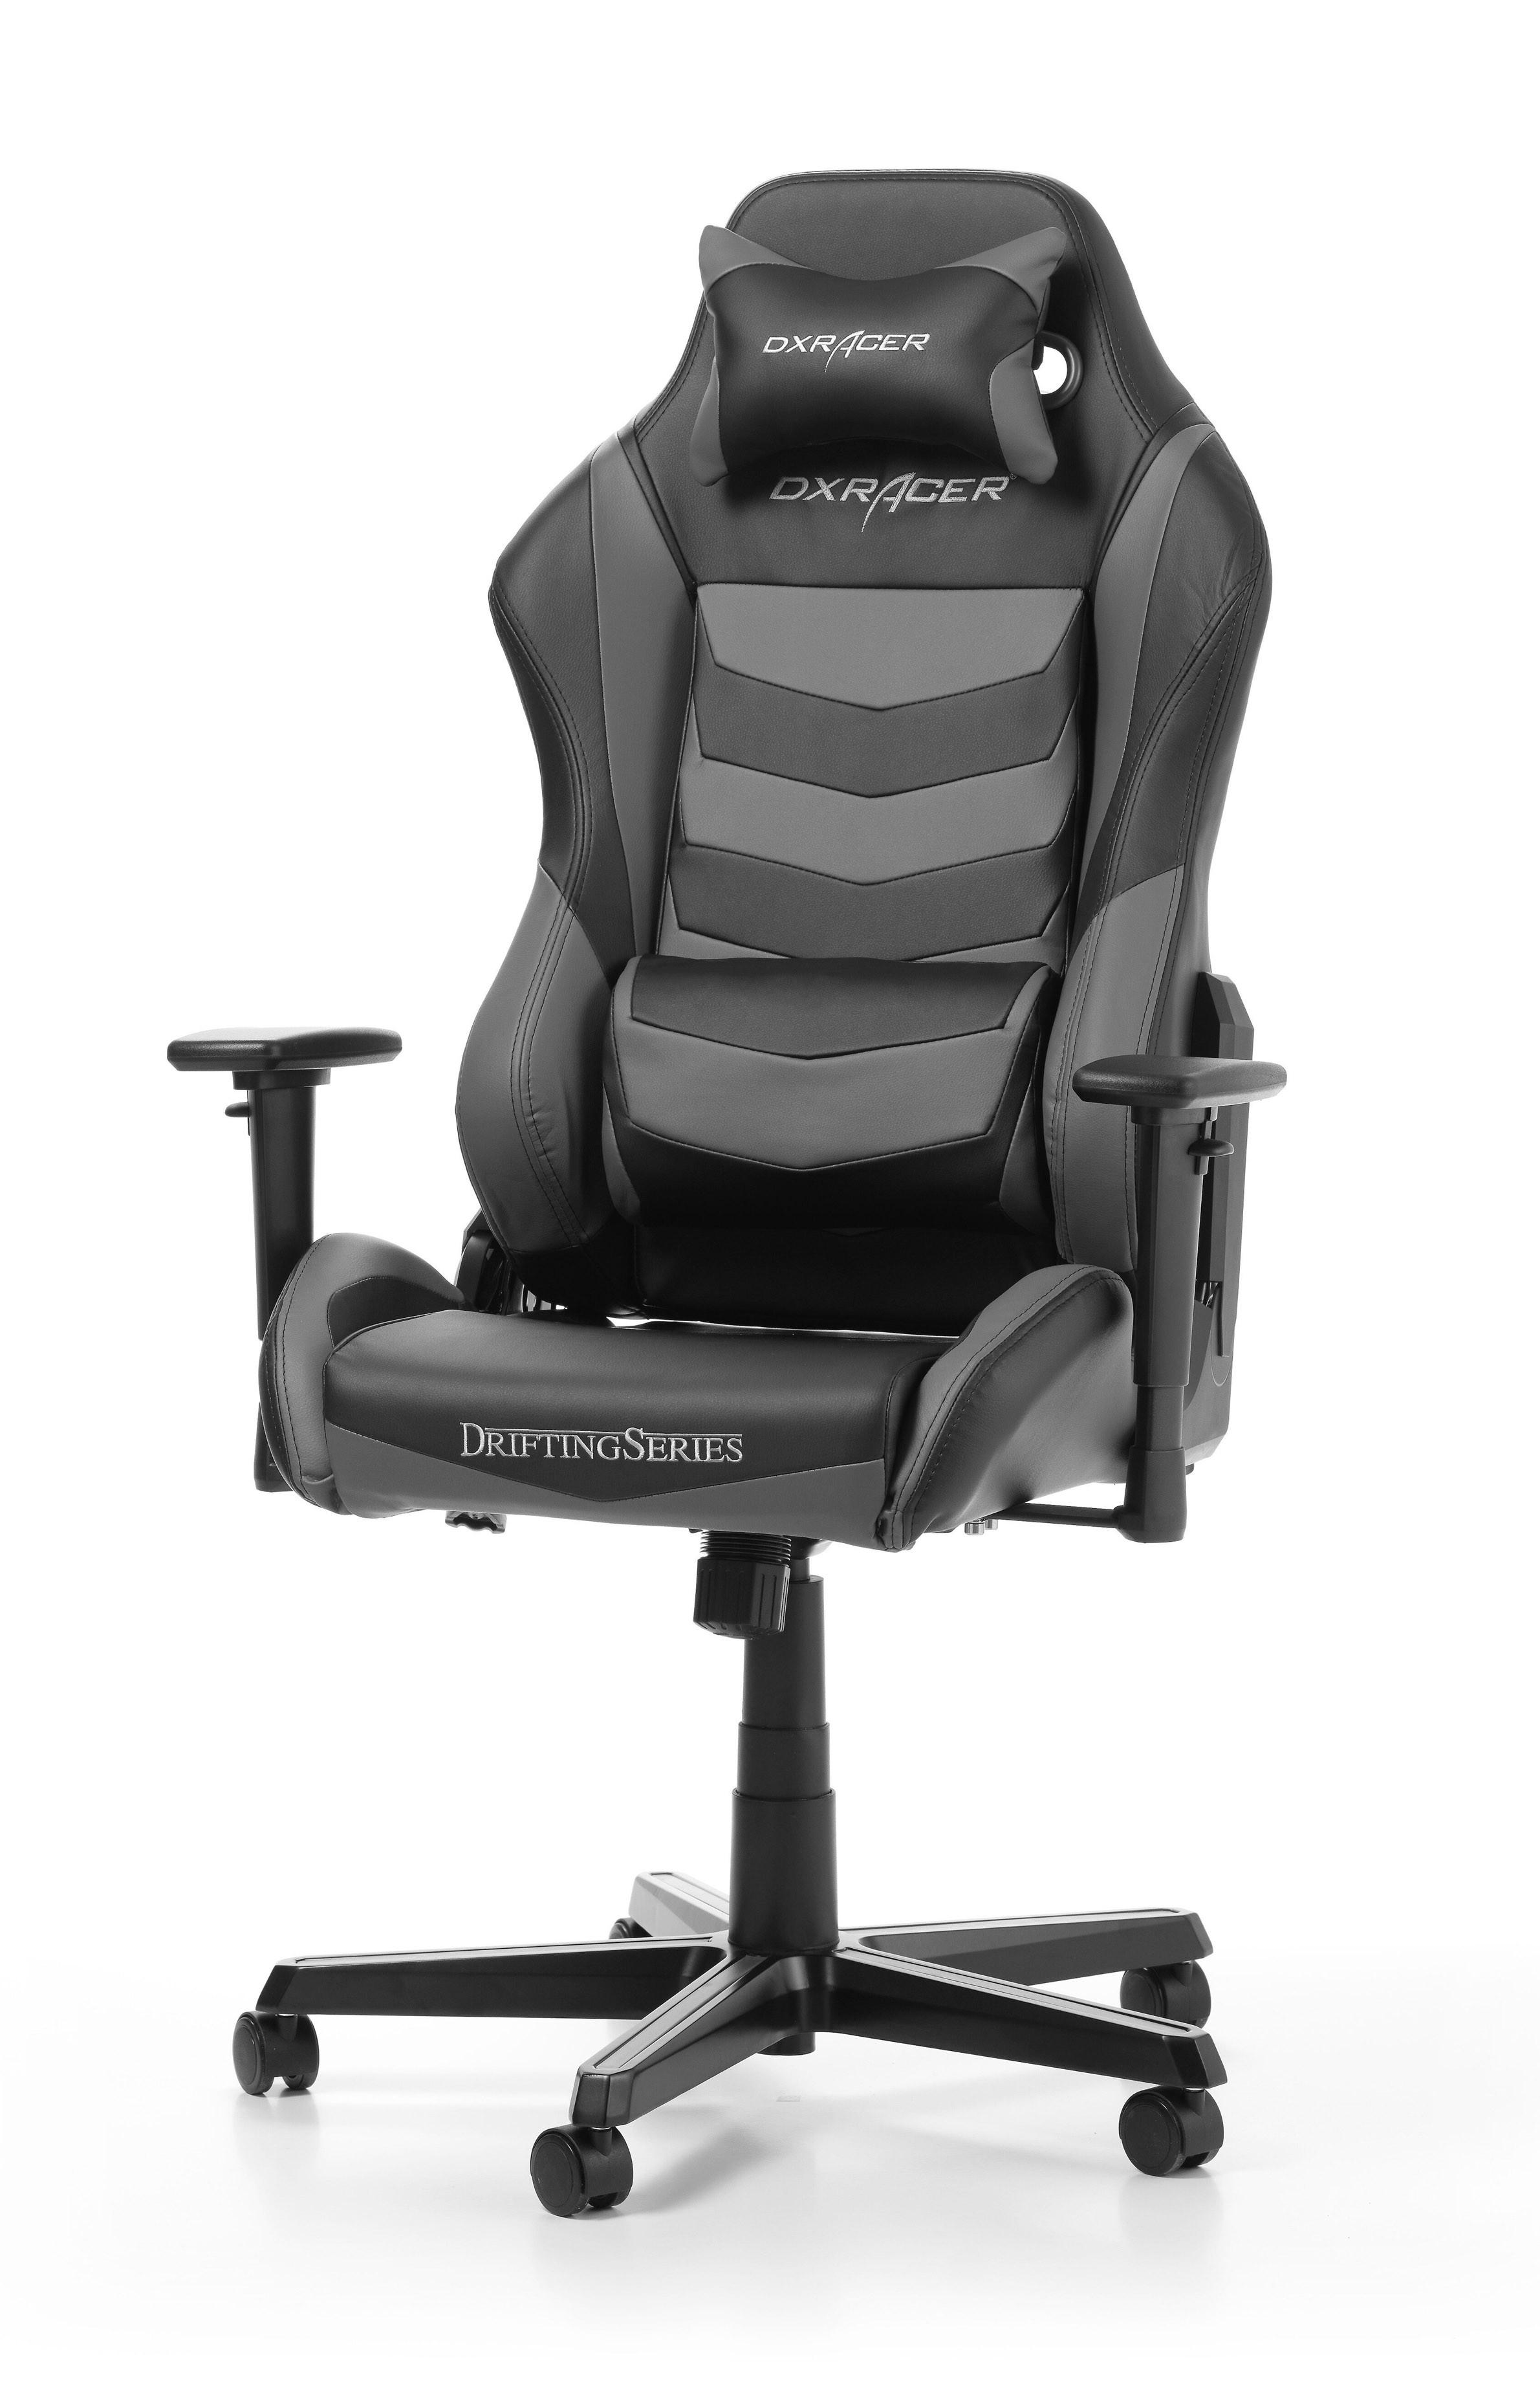 DXRACER DRIFTING SERIES D166-N juoda ergonmominė kėdė